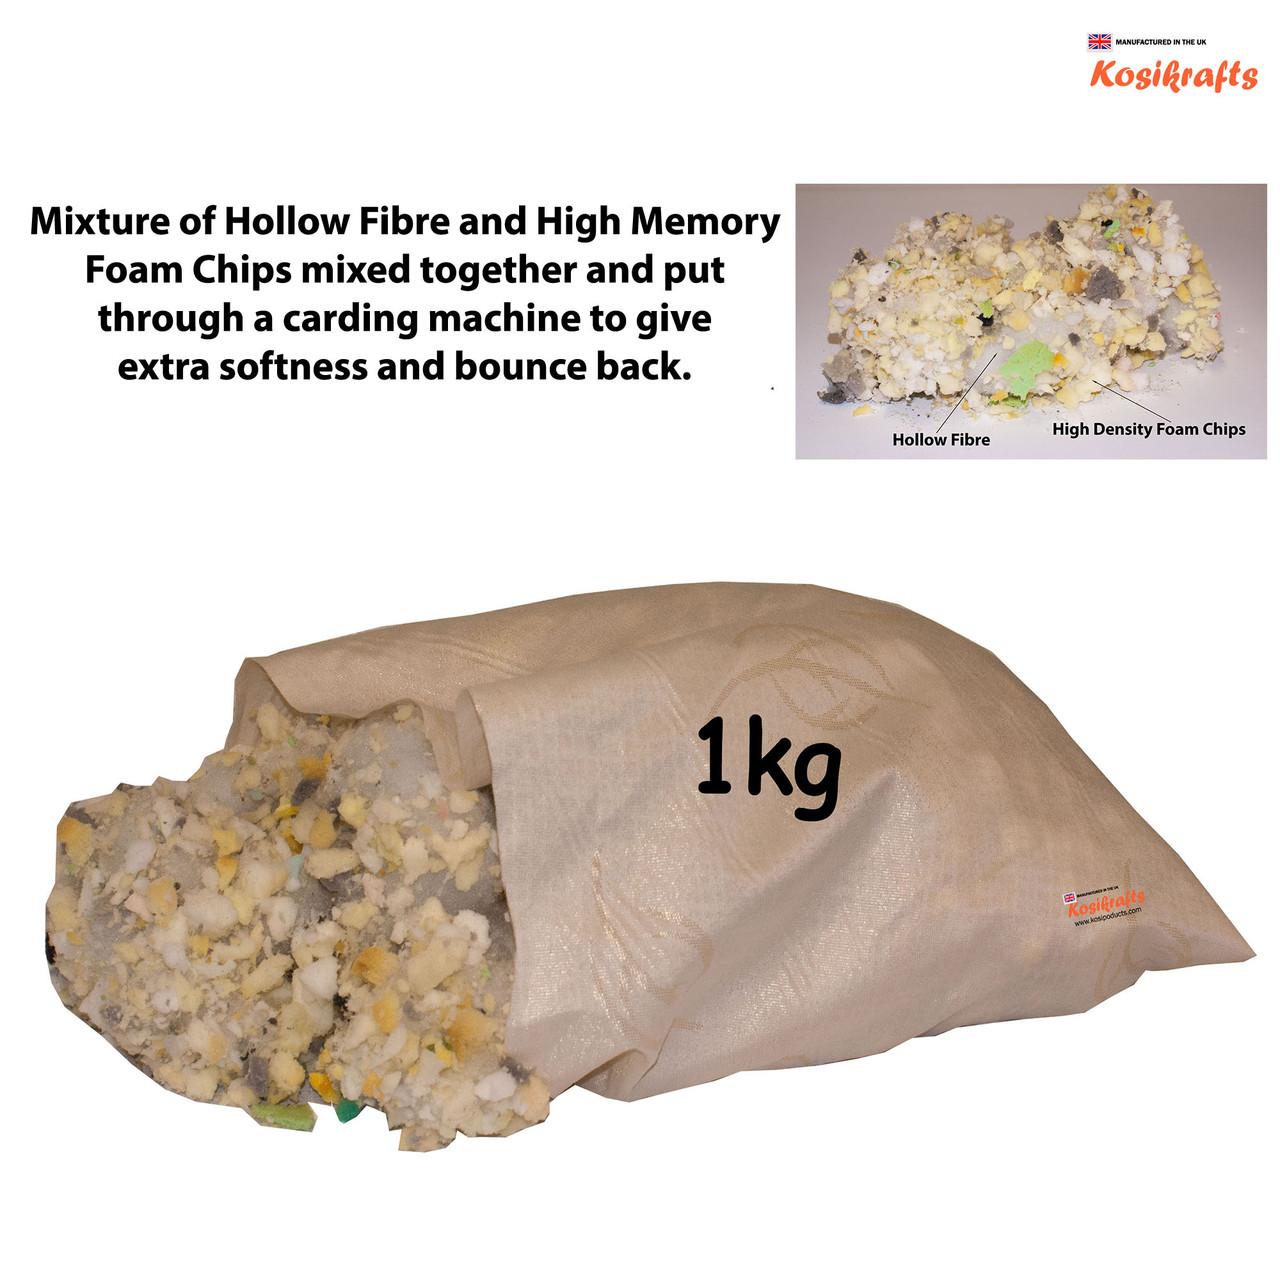 kosikrafts 1kg hollow fibre + Memory Foam mix cushion toy stuffing filling